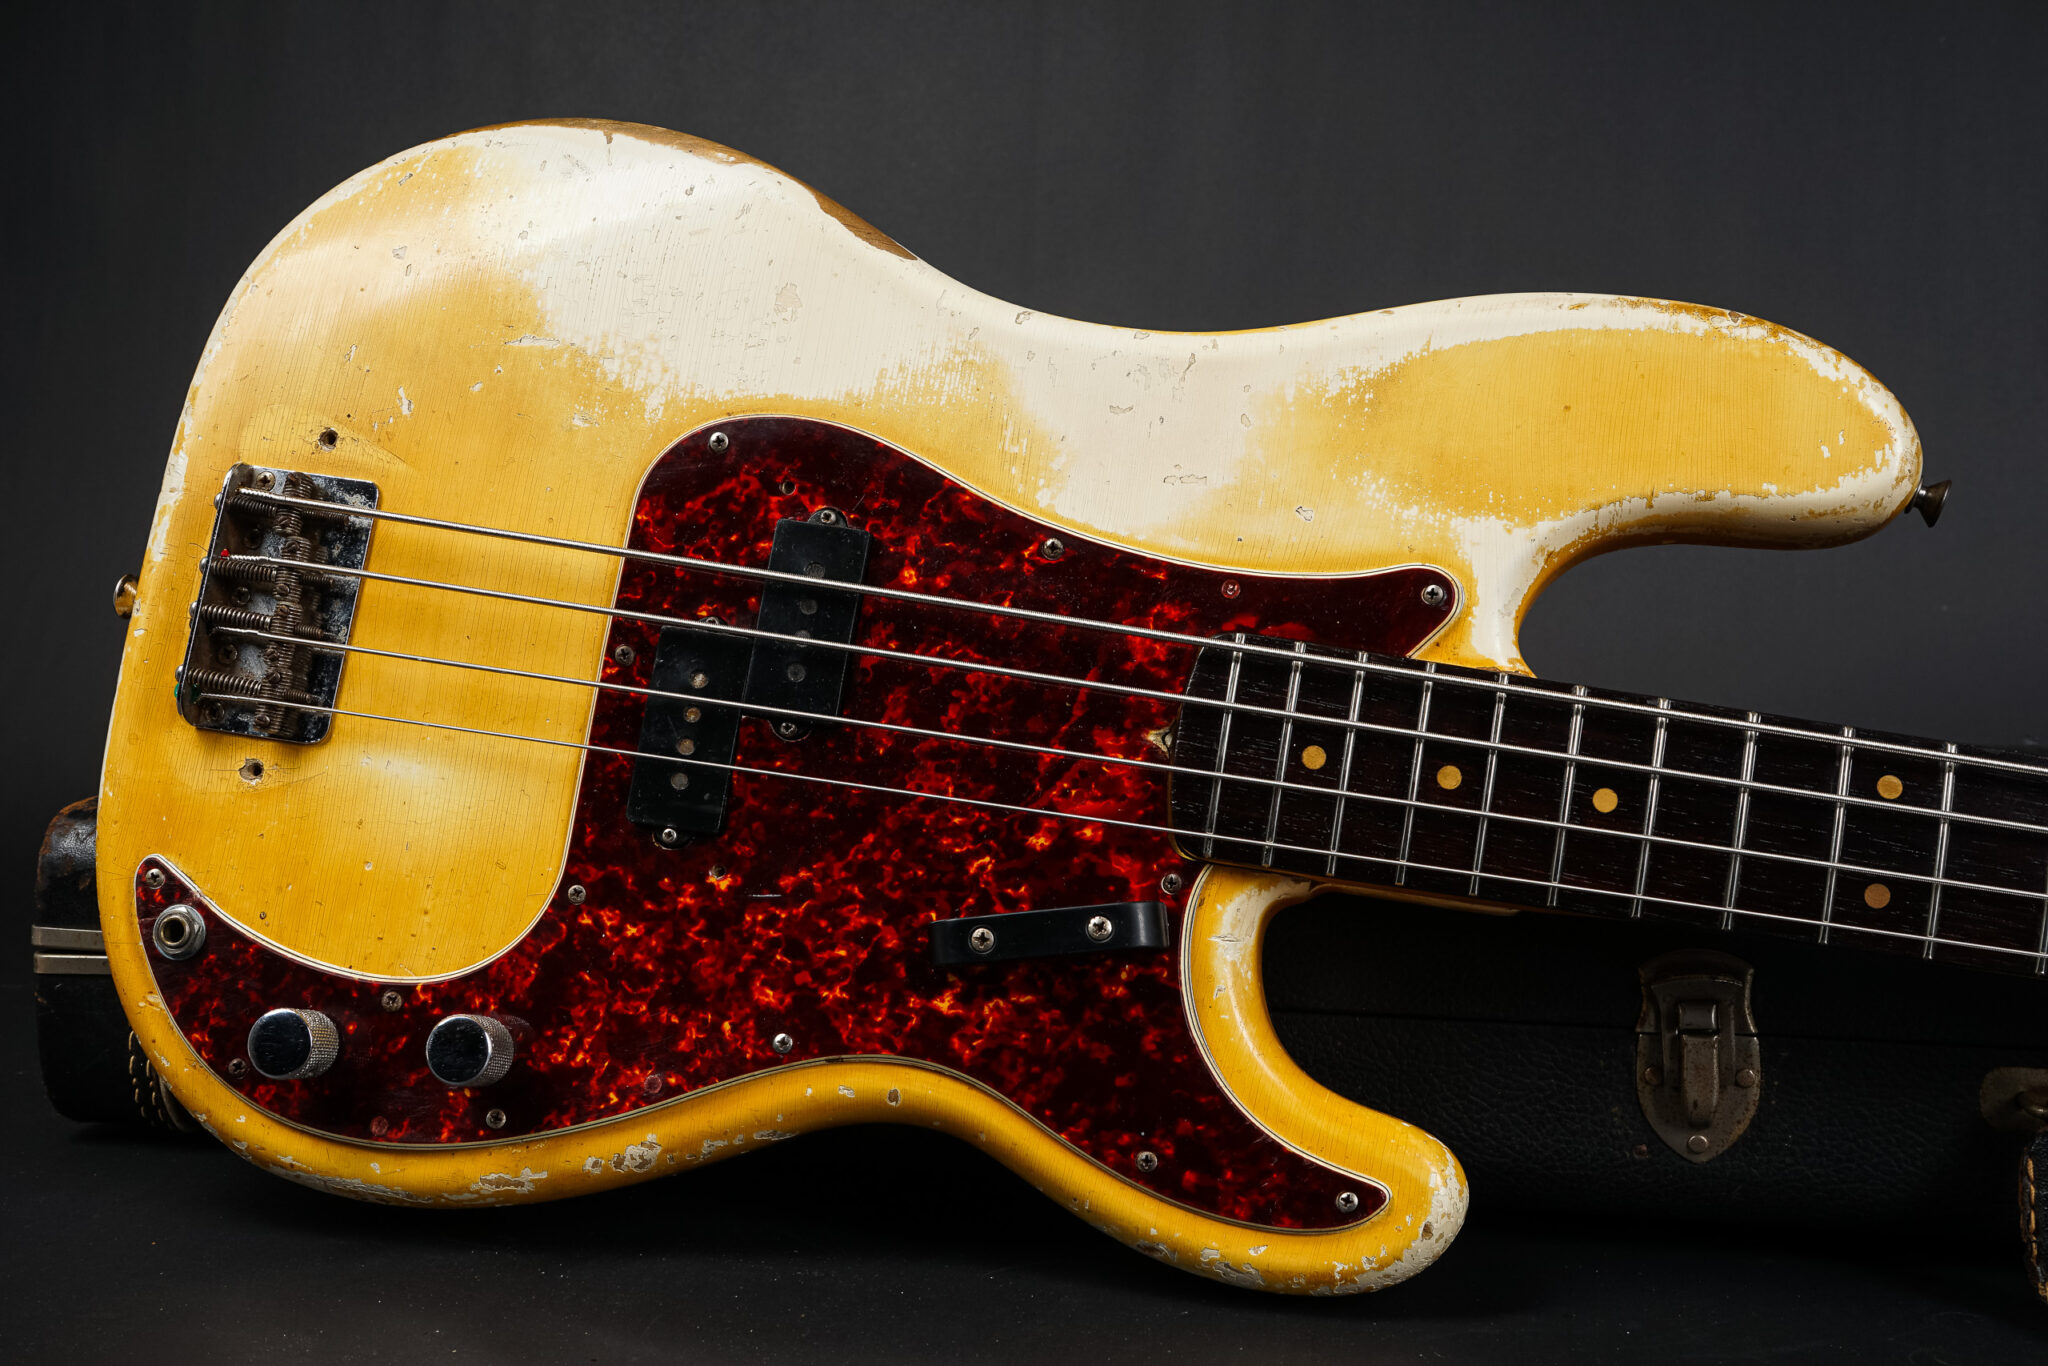 https://guitarpoint.de/app/uploads/products/1964-fender-precision-bass-olympic-white/1964-Fender-Precision-Bass-OWT-L30756-9-2048x1366.jpg